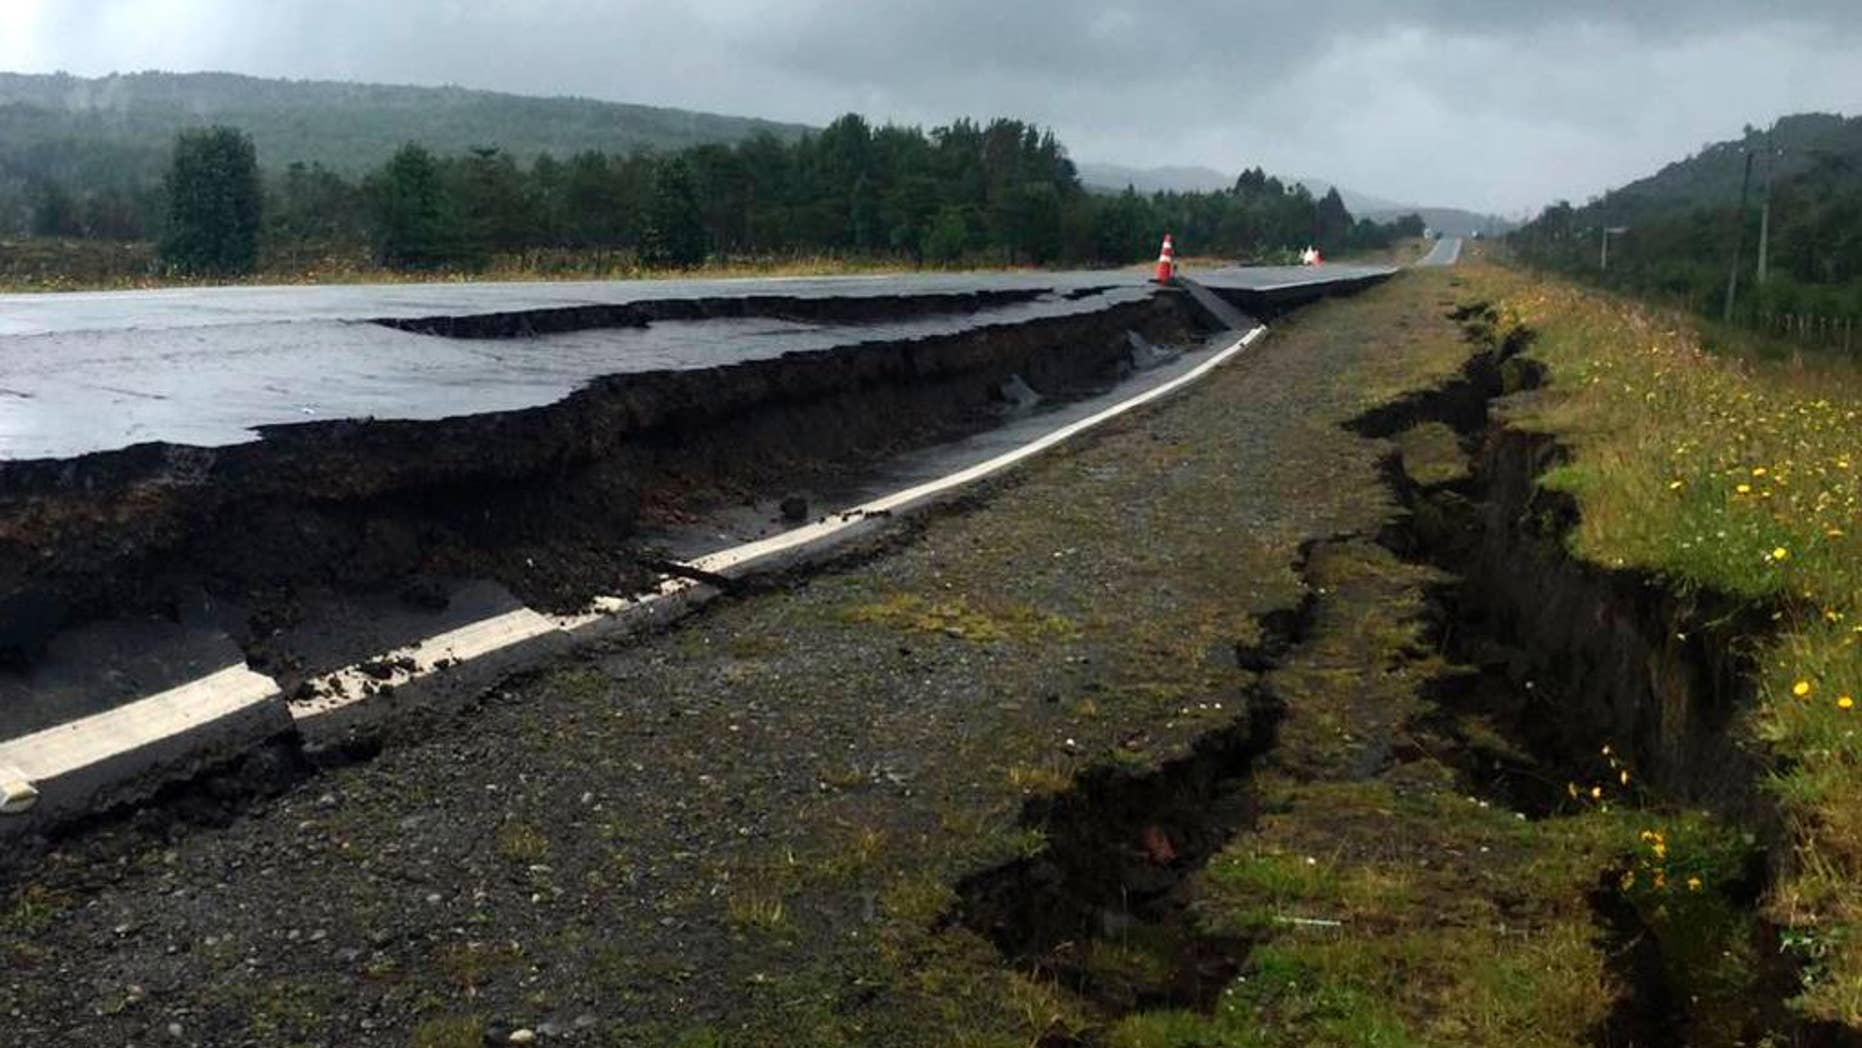 Cracks appear in and along a road near Quellon, Chile, Sunday, Dec. 25, 2016, after an earthquake. (Edinson Capdevilla/Aton via AP)